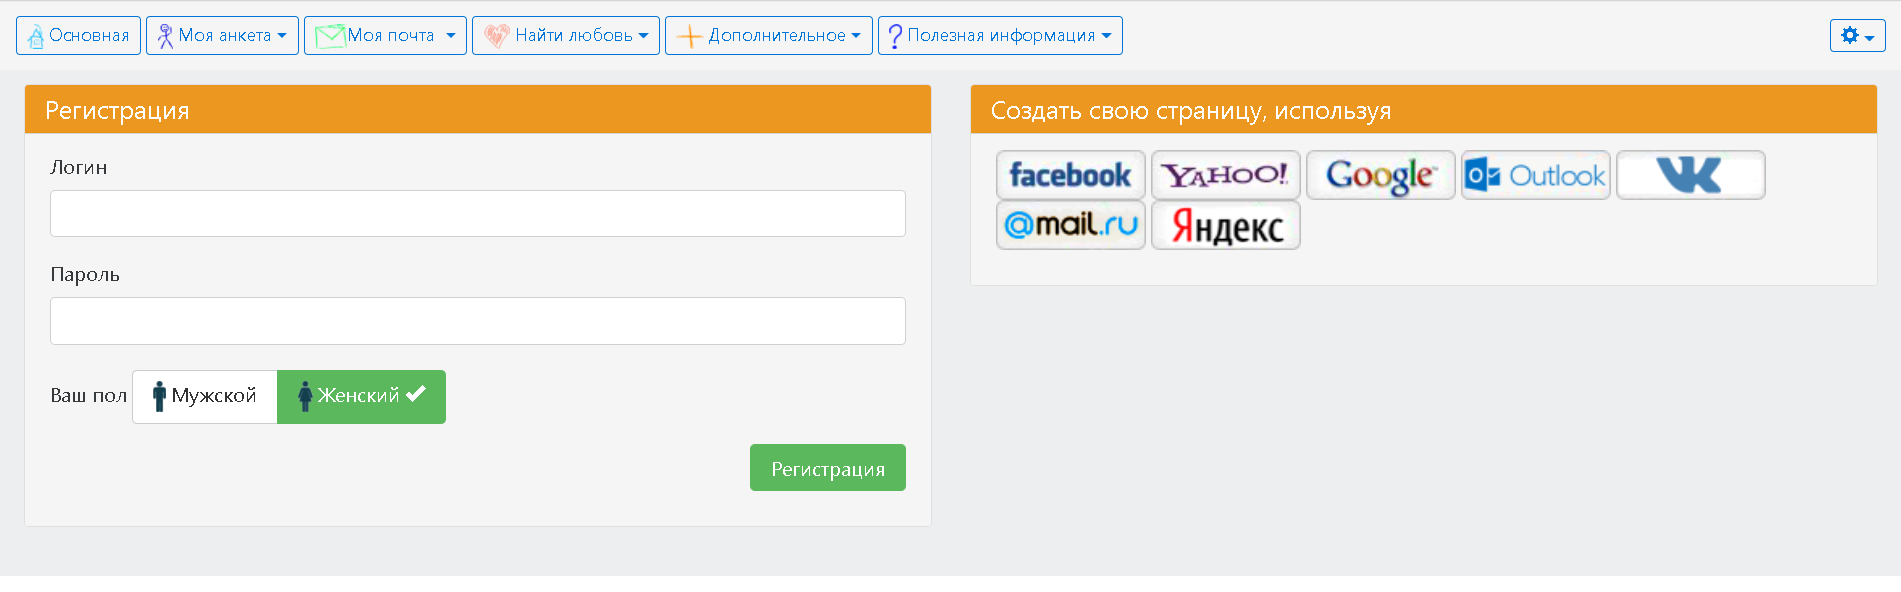 Free-russian-dating.net